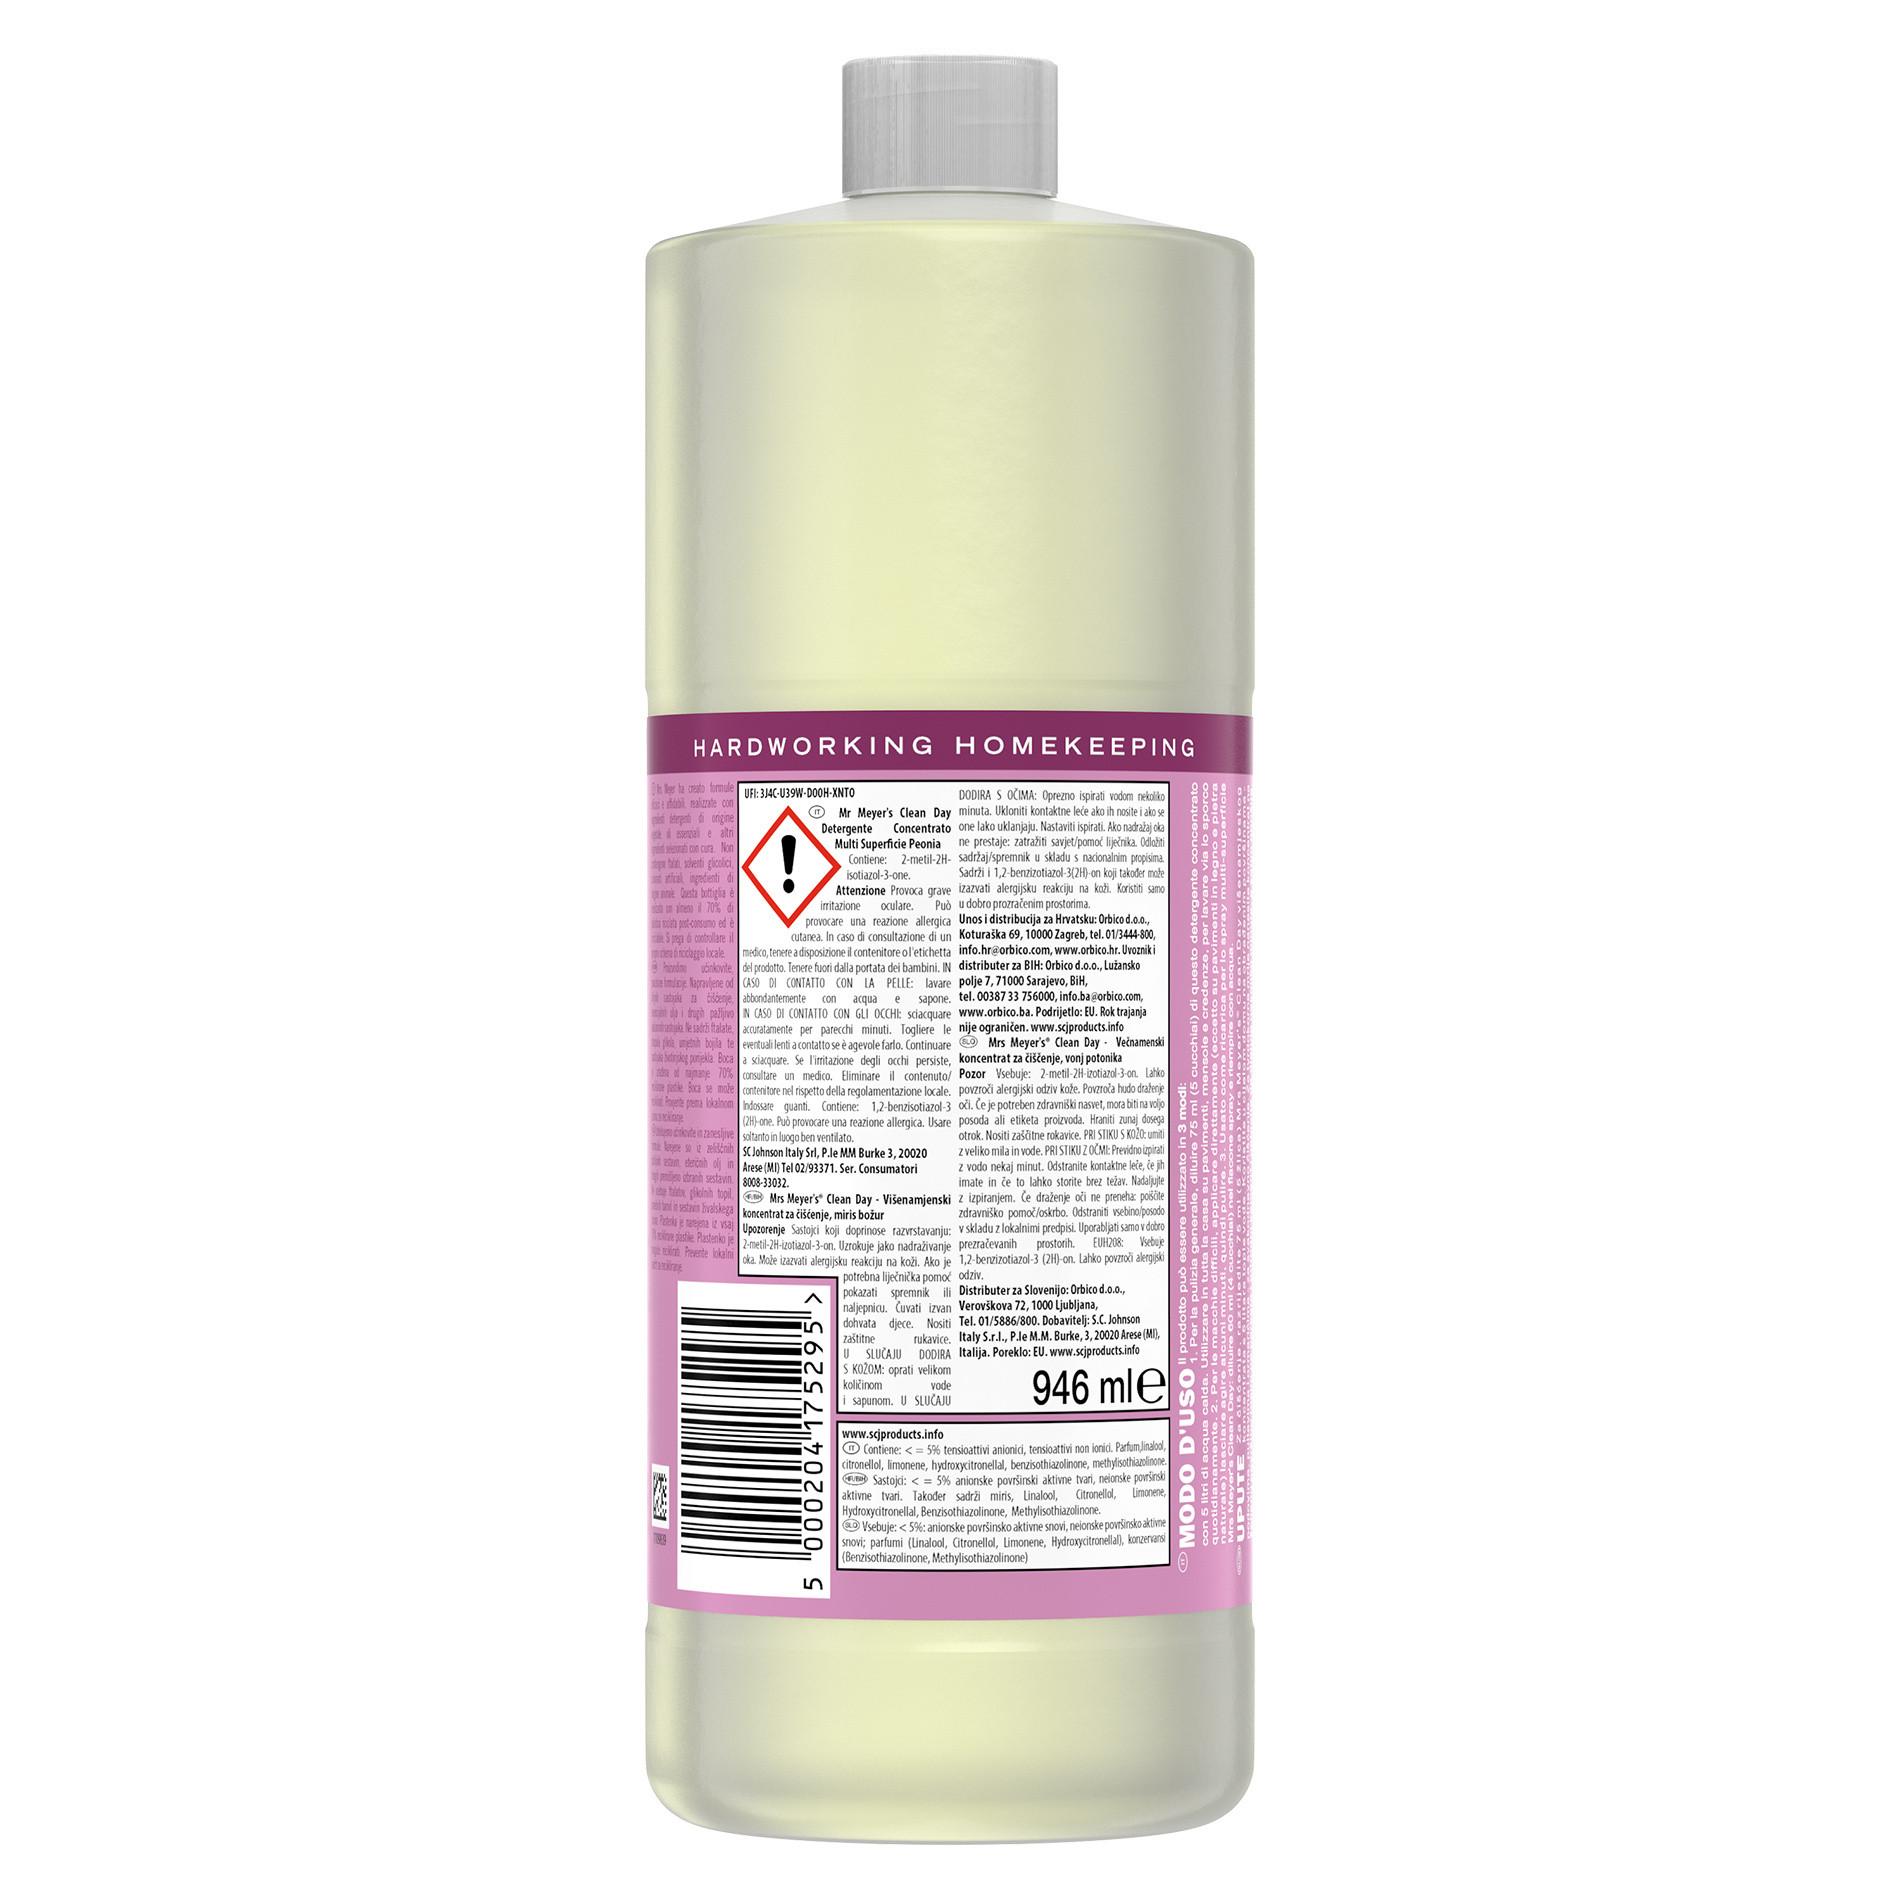 Detergente concentrato multi-supericie profumo di peonia 946ml, Rosa, large image number 1